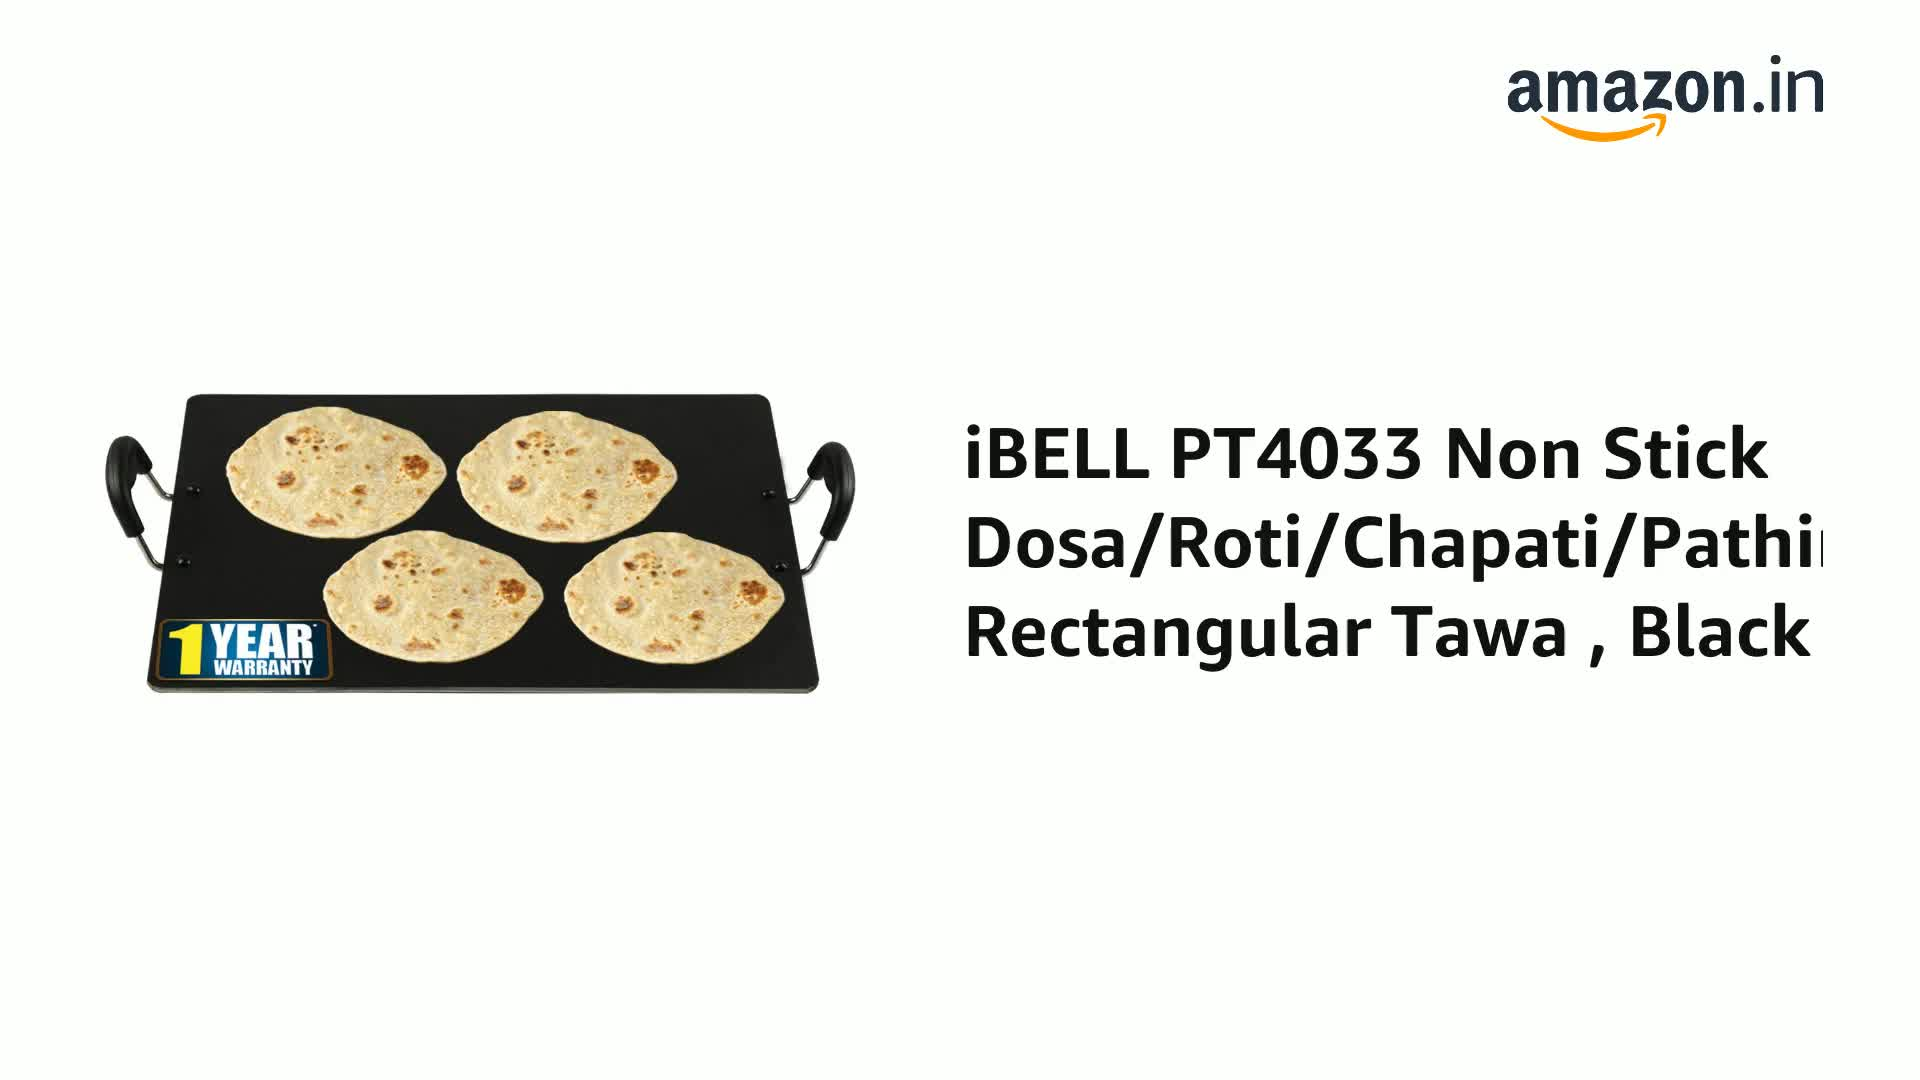 iBELL-IBLPT4033-Non-Stick-DosaRotiChapatiPathiri-Rectangular-Tawa-Black-Aluminium-Black